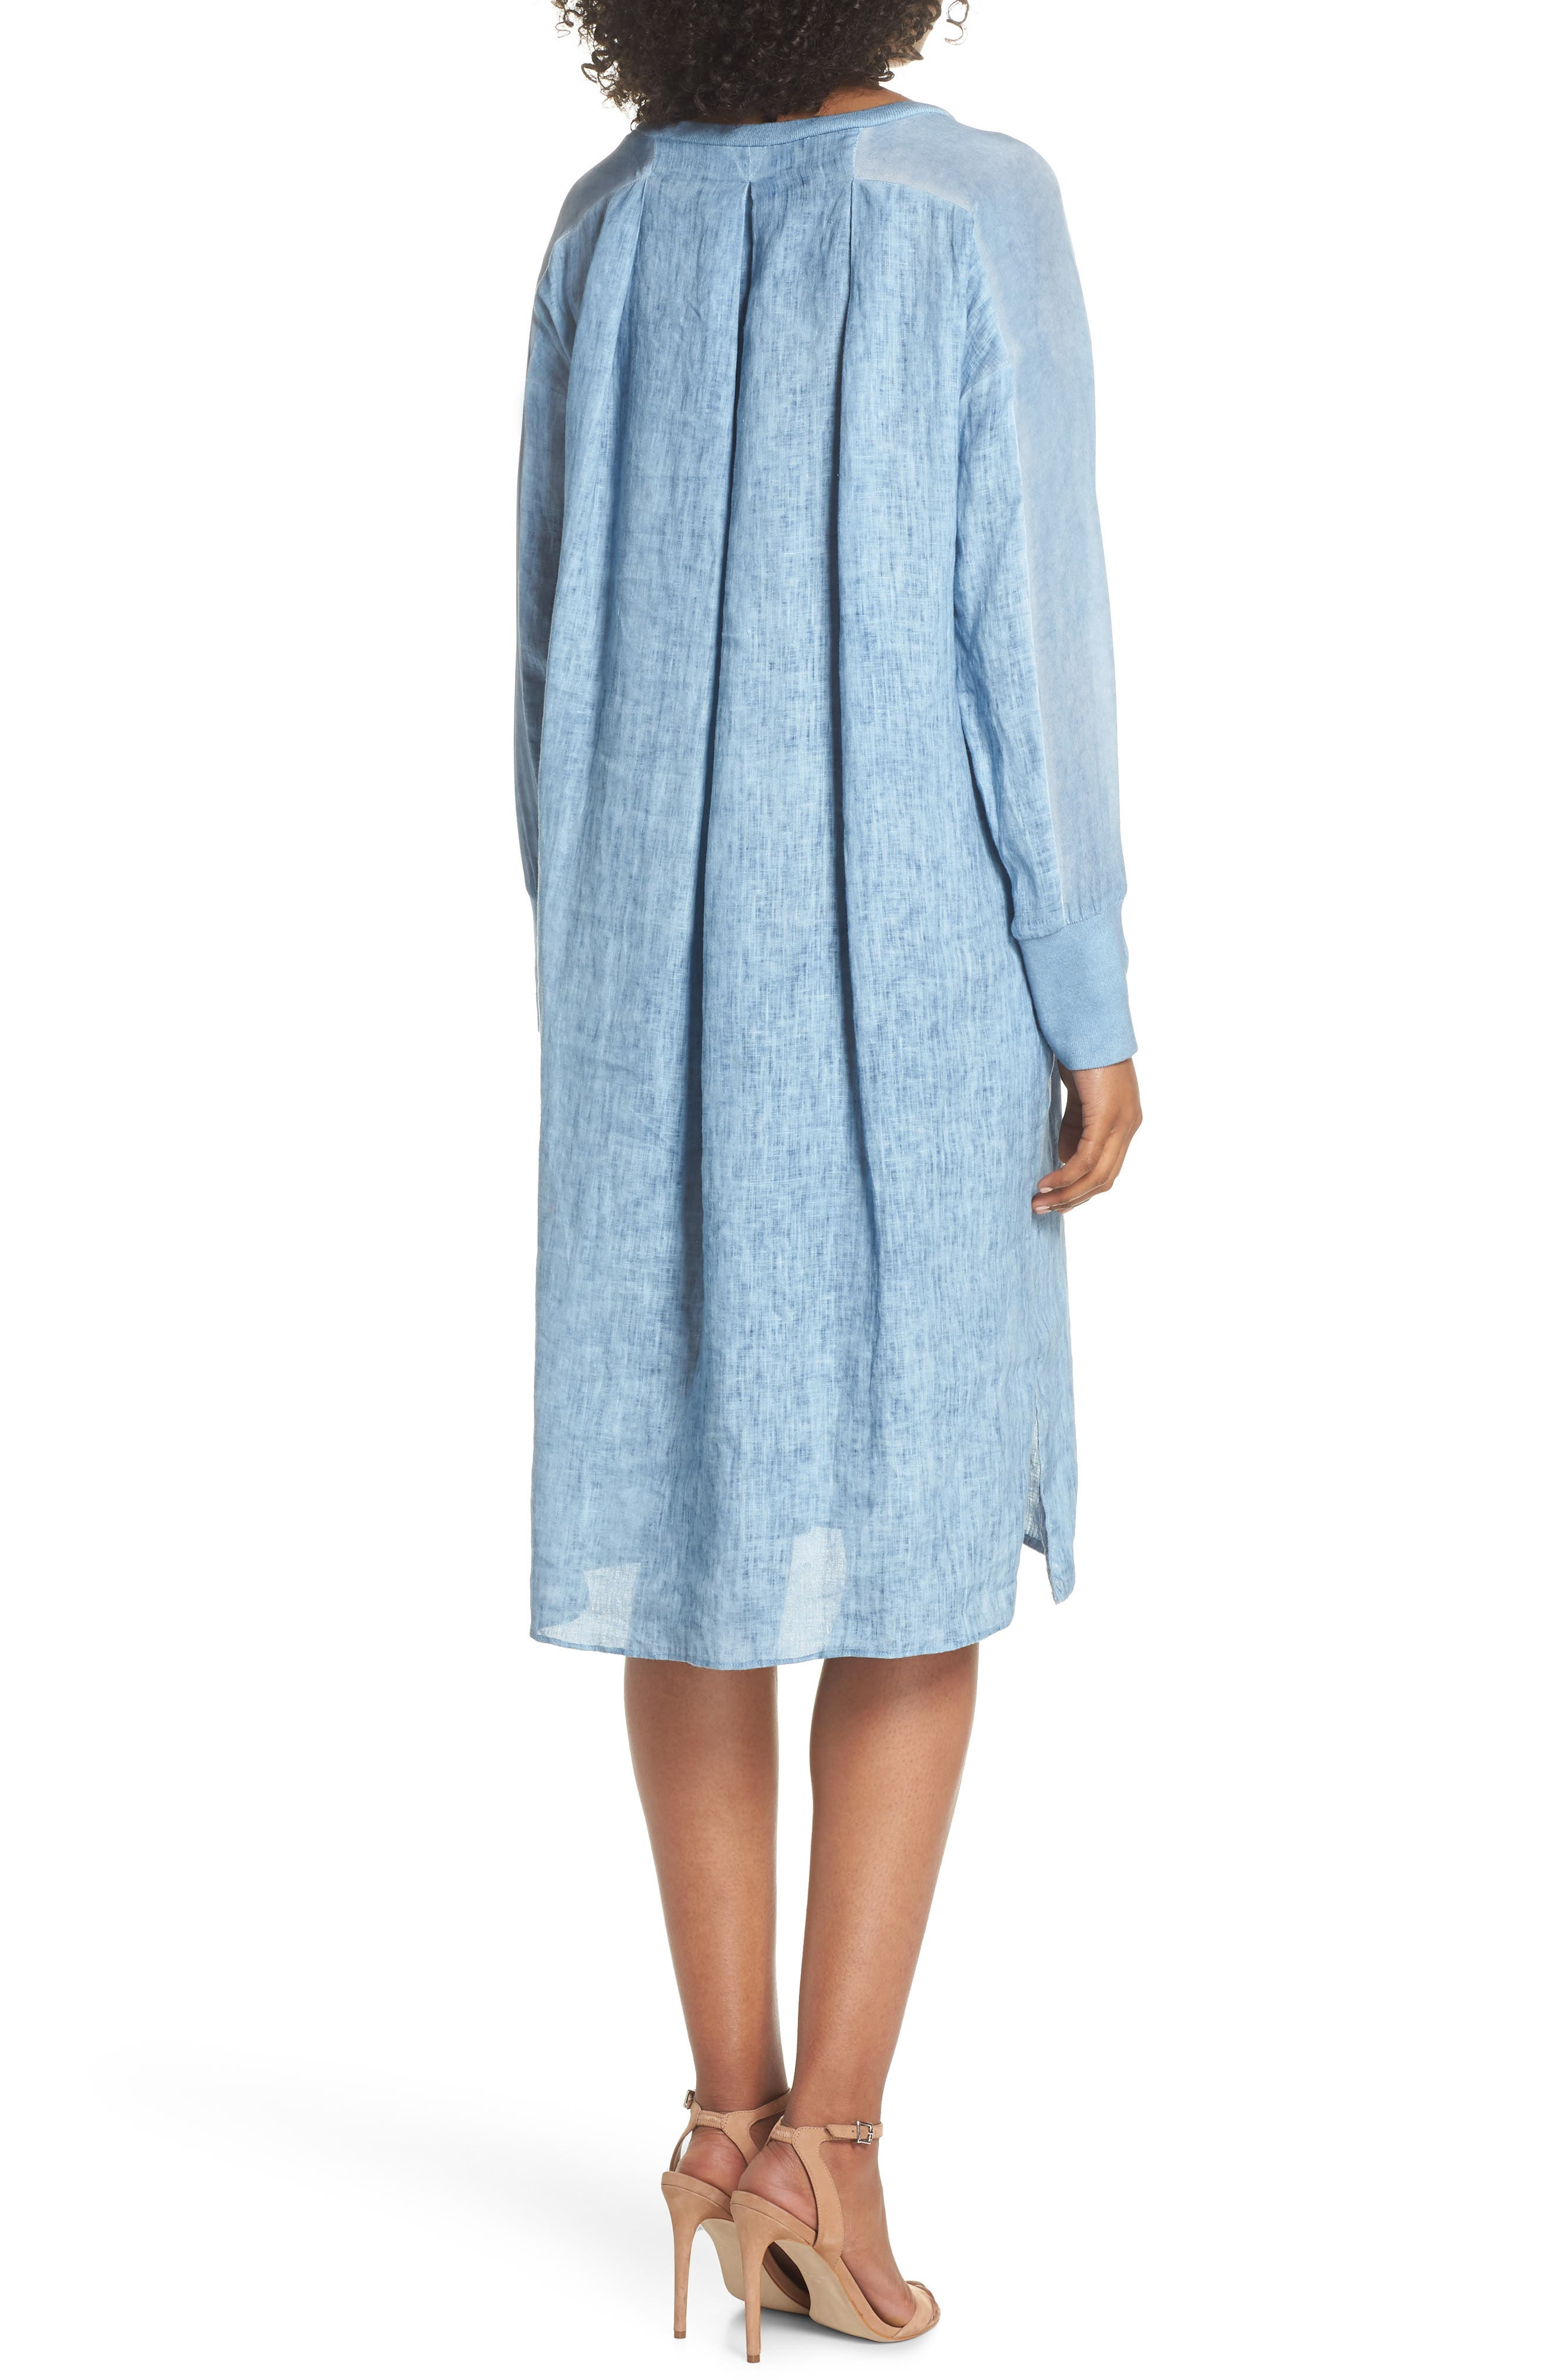 Rata Linen Shift Dress,                             Alternate thumbnail 2, color,                             Blue